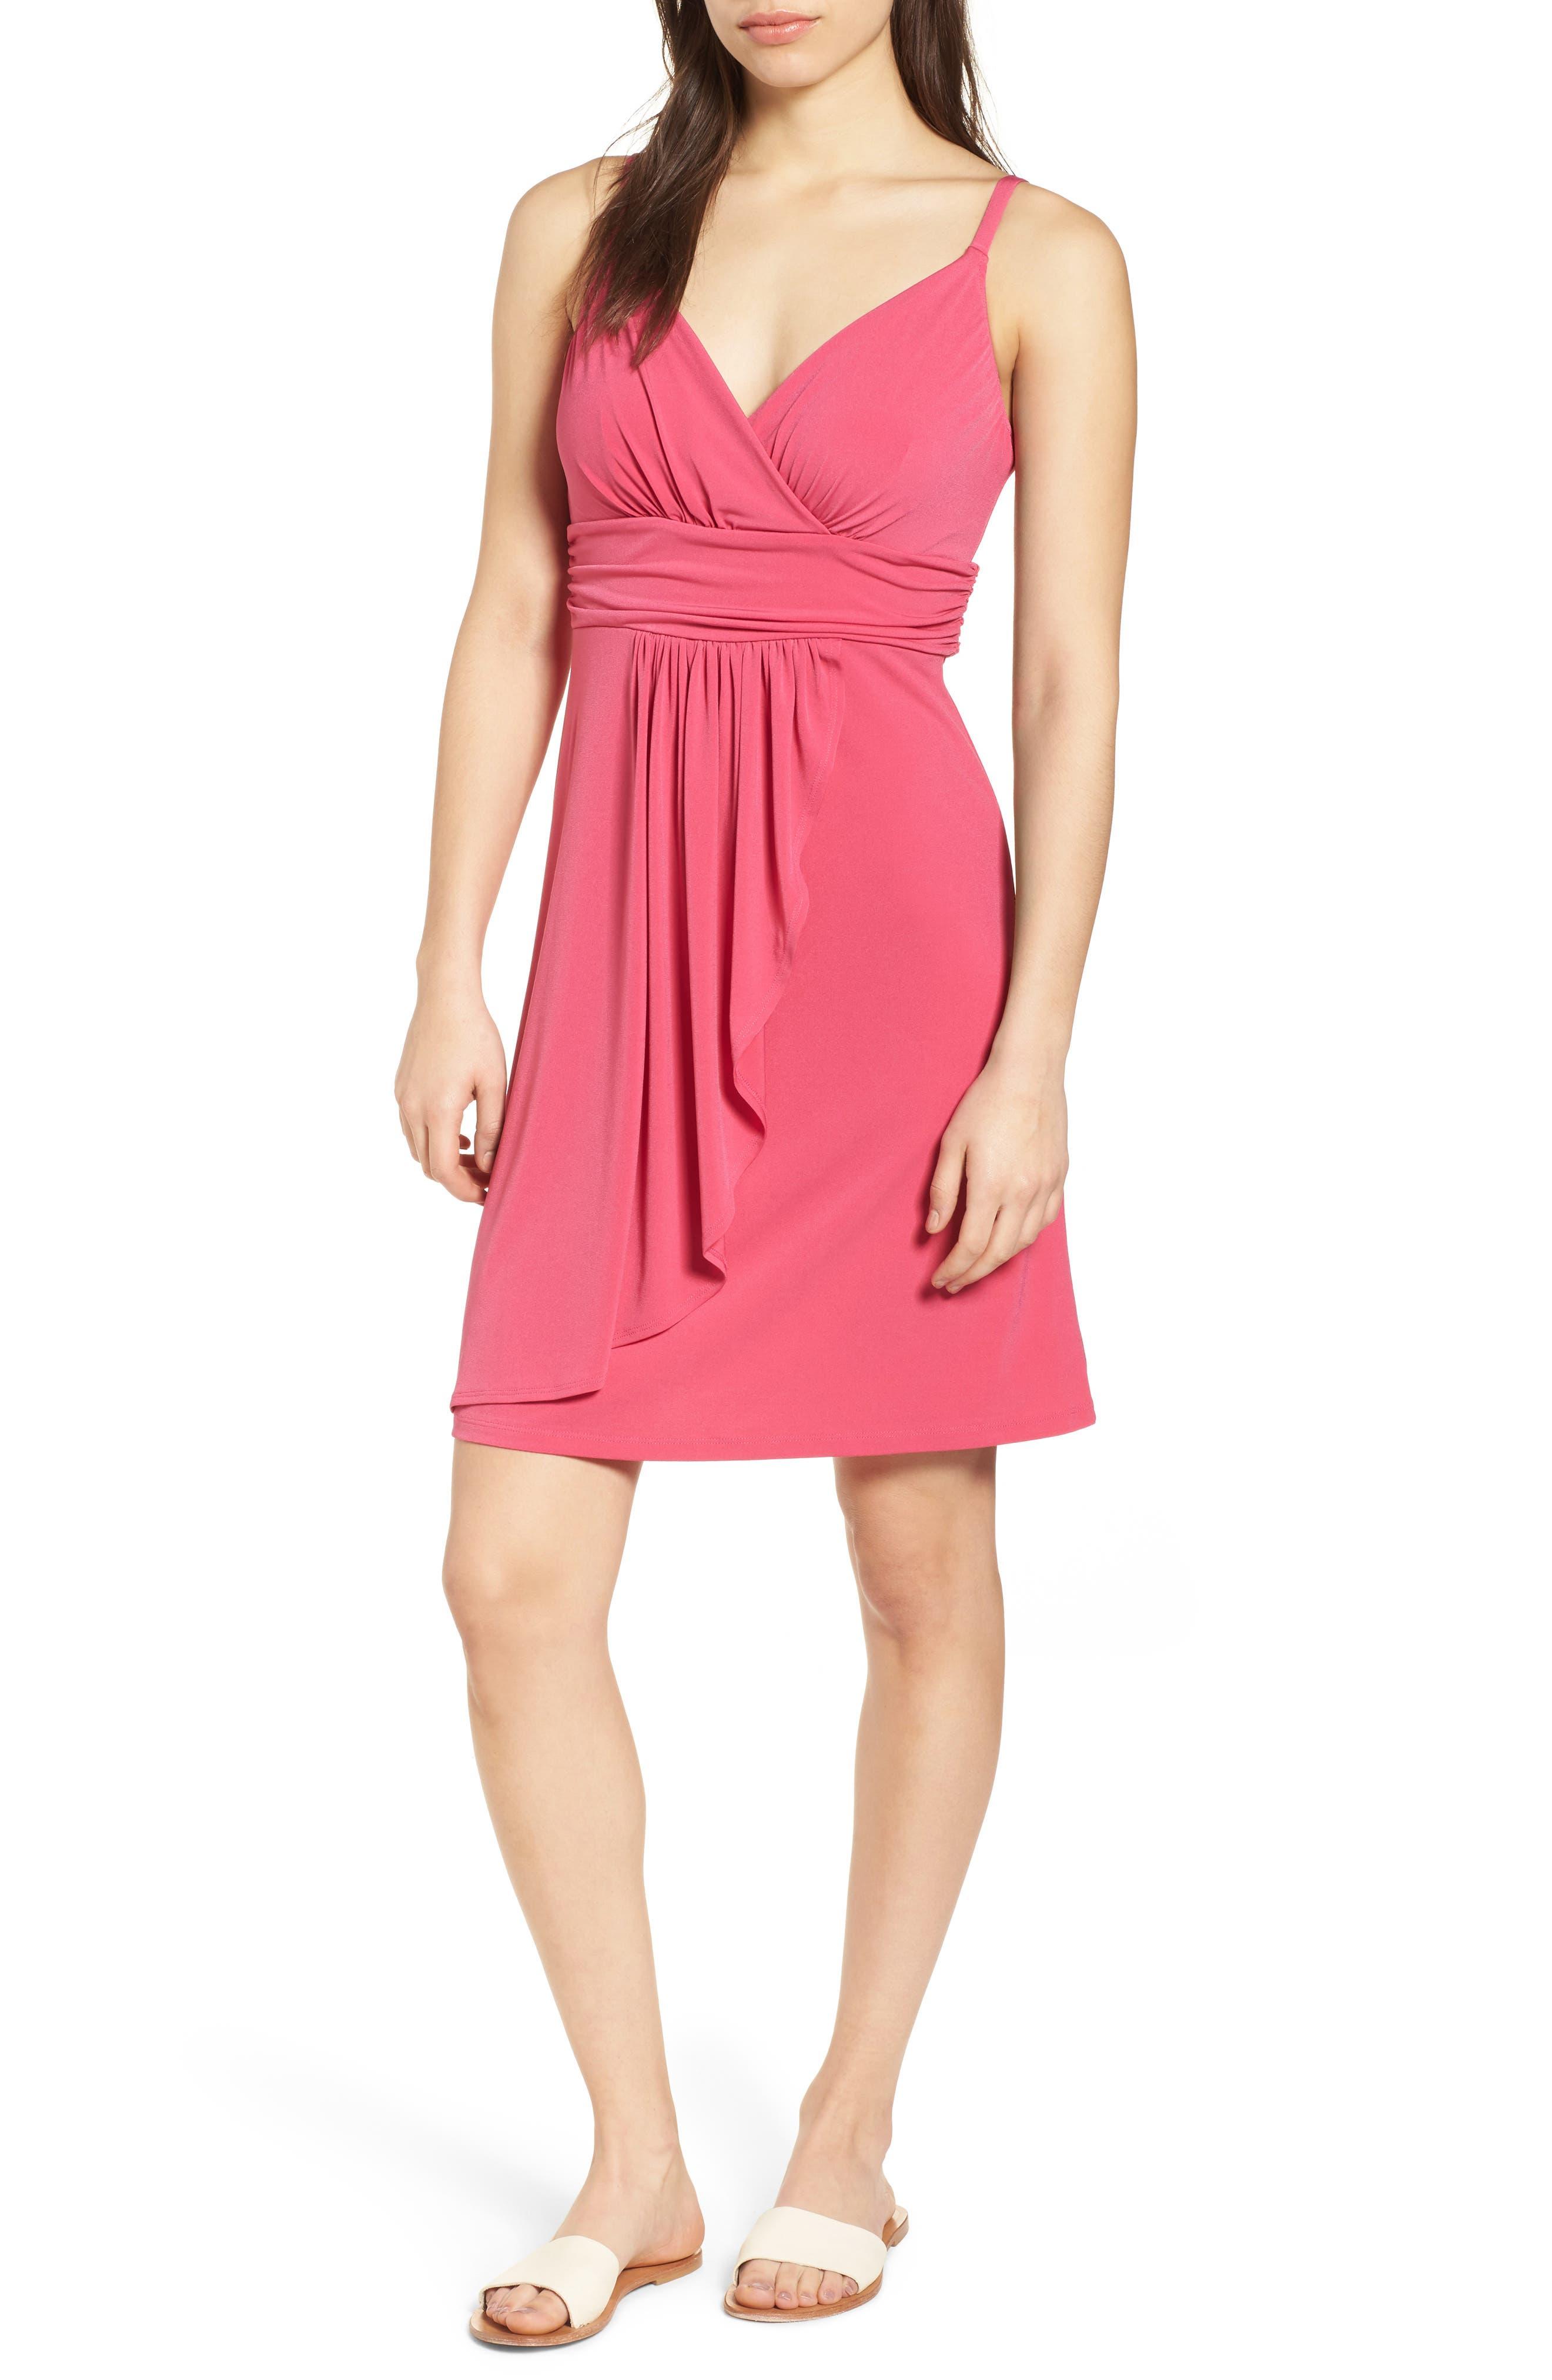 Elenna Stretch Jersey Sundress,                             Main thumbnail 1, color,                             Bright Blush